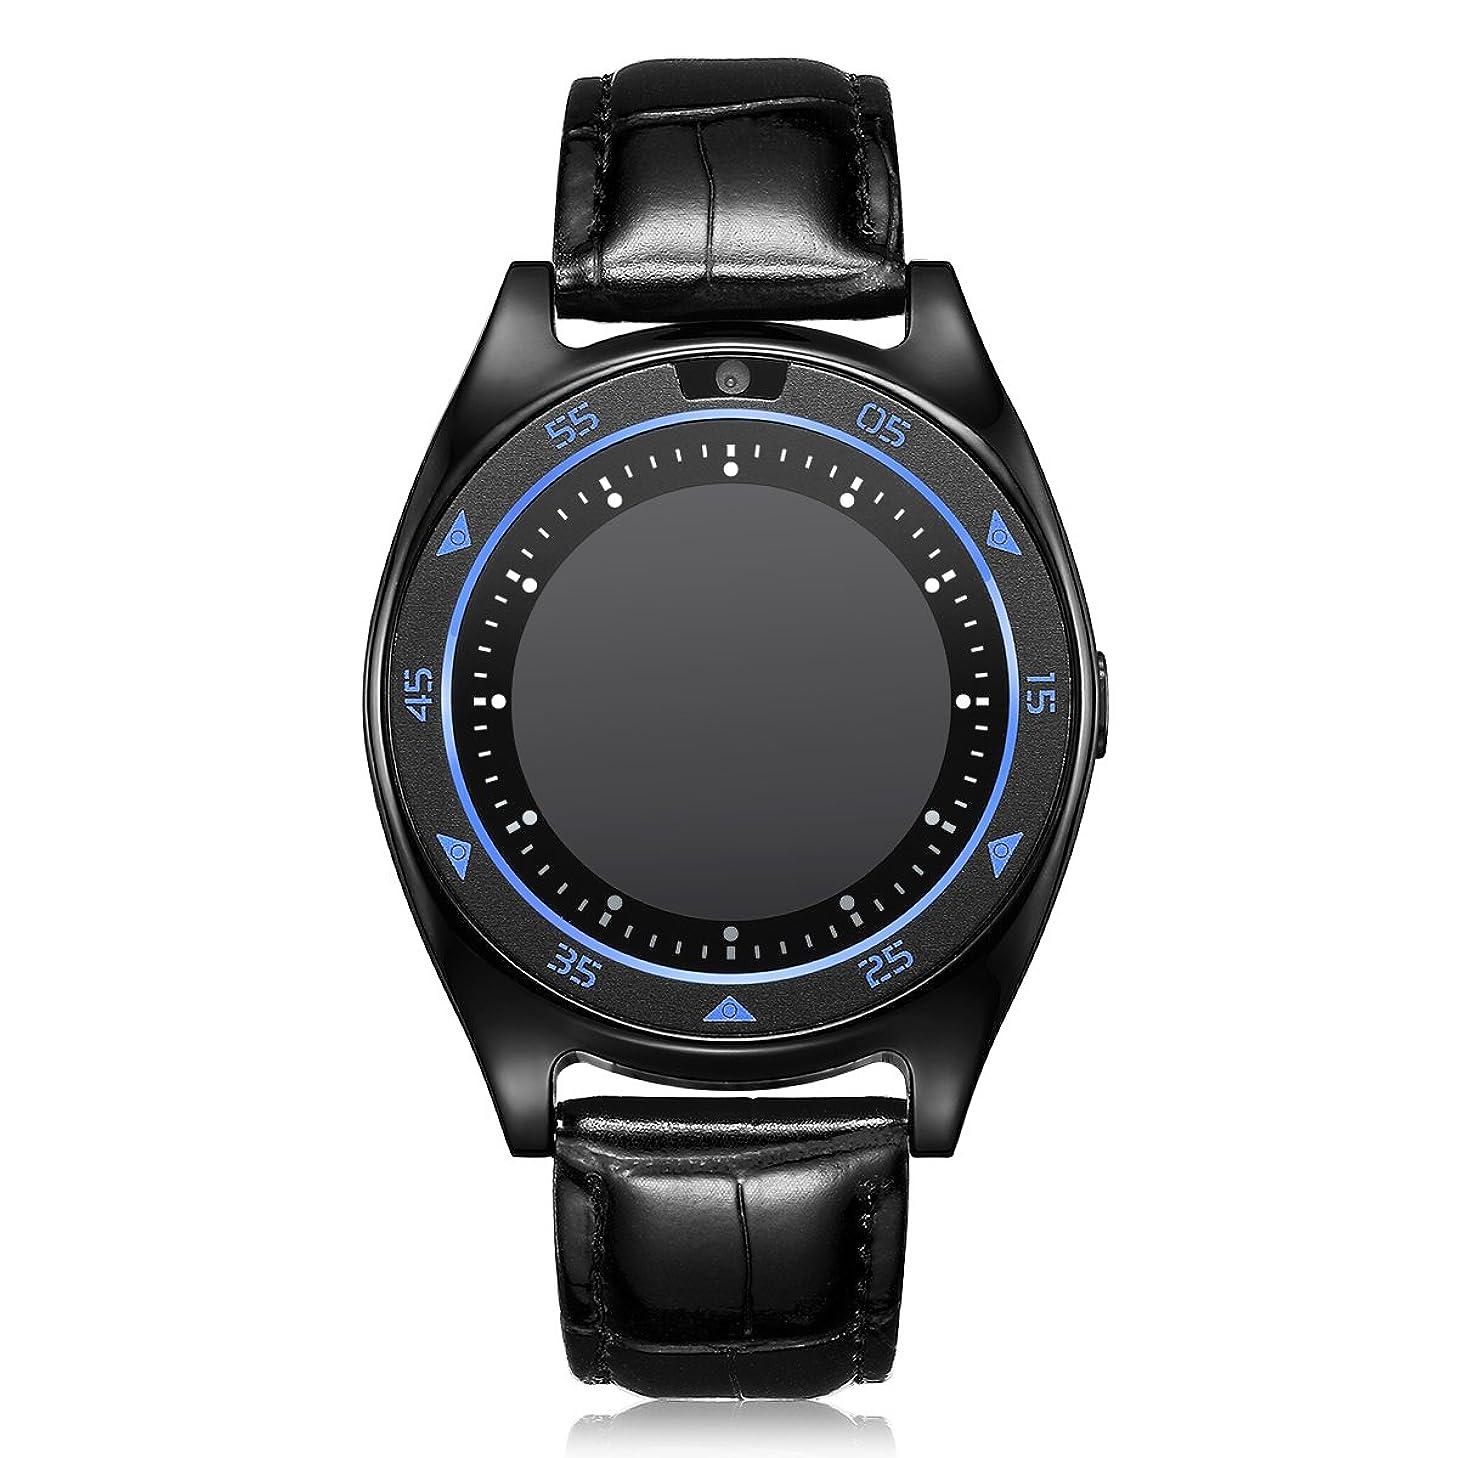 Unlocked Smart Watch Phone IIDA Bluetooth Fitness Tracker Watches Heart Rate/Blood Pressure/Blood Oxygen Monitor/Sleep Monitor Touch Screen SIM Card (Black)